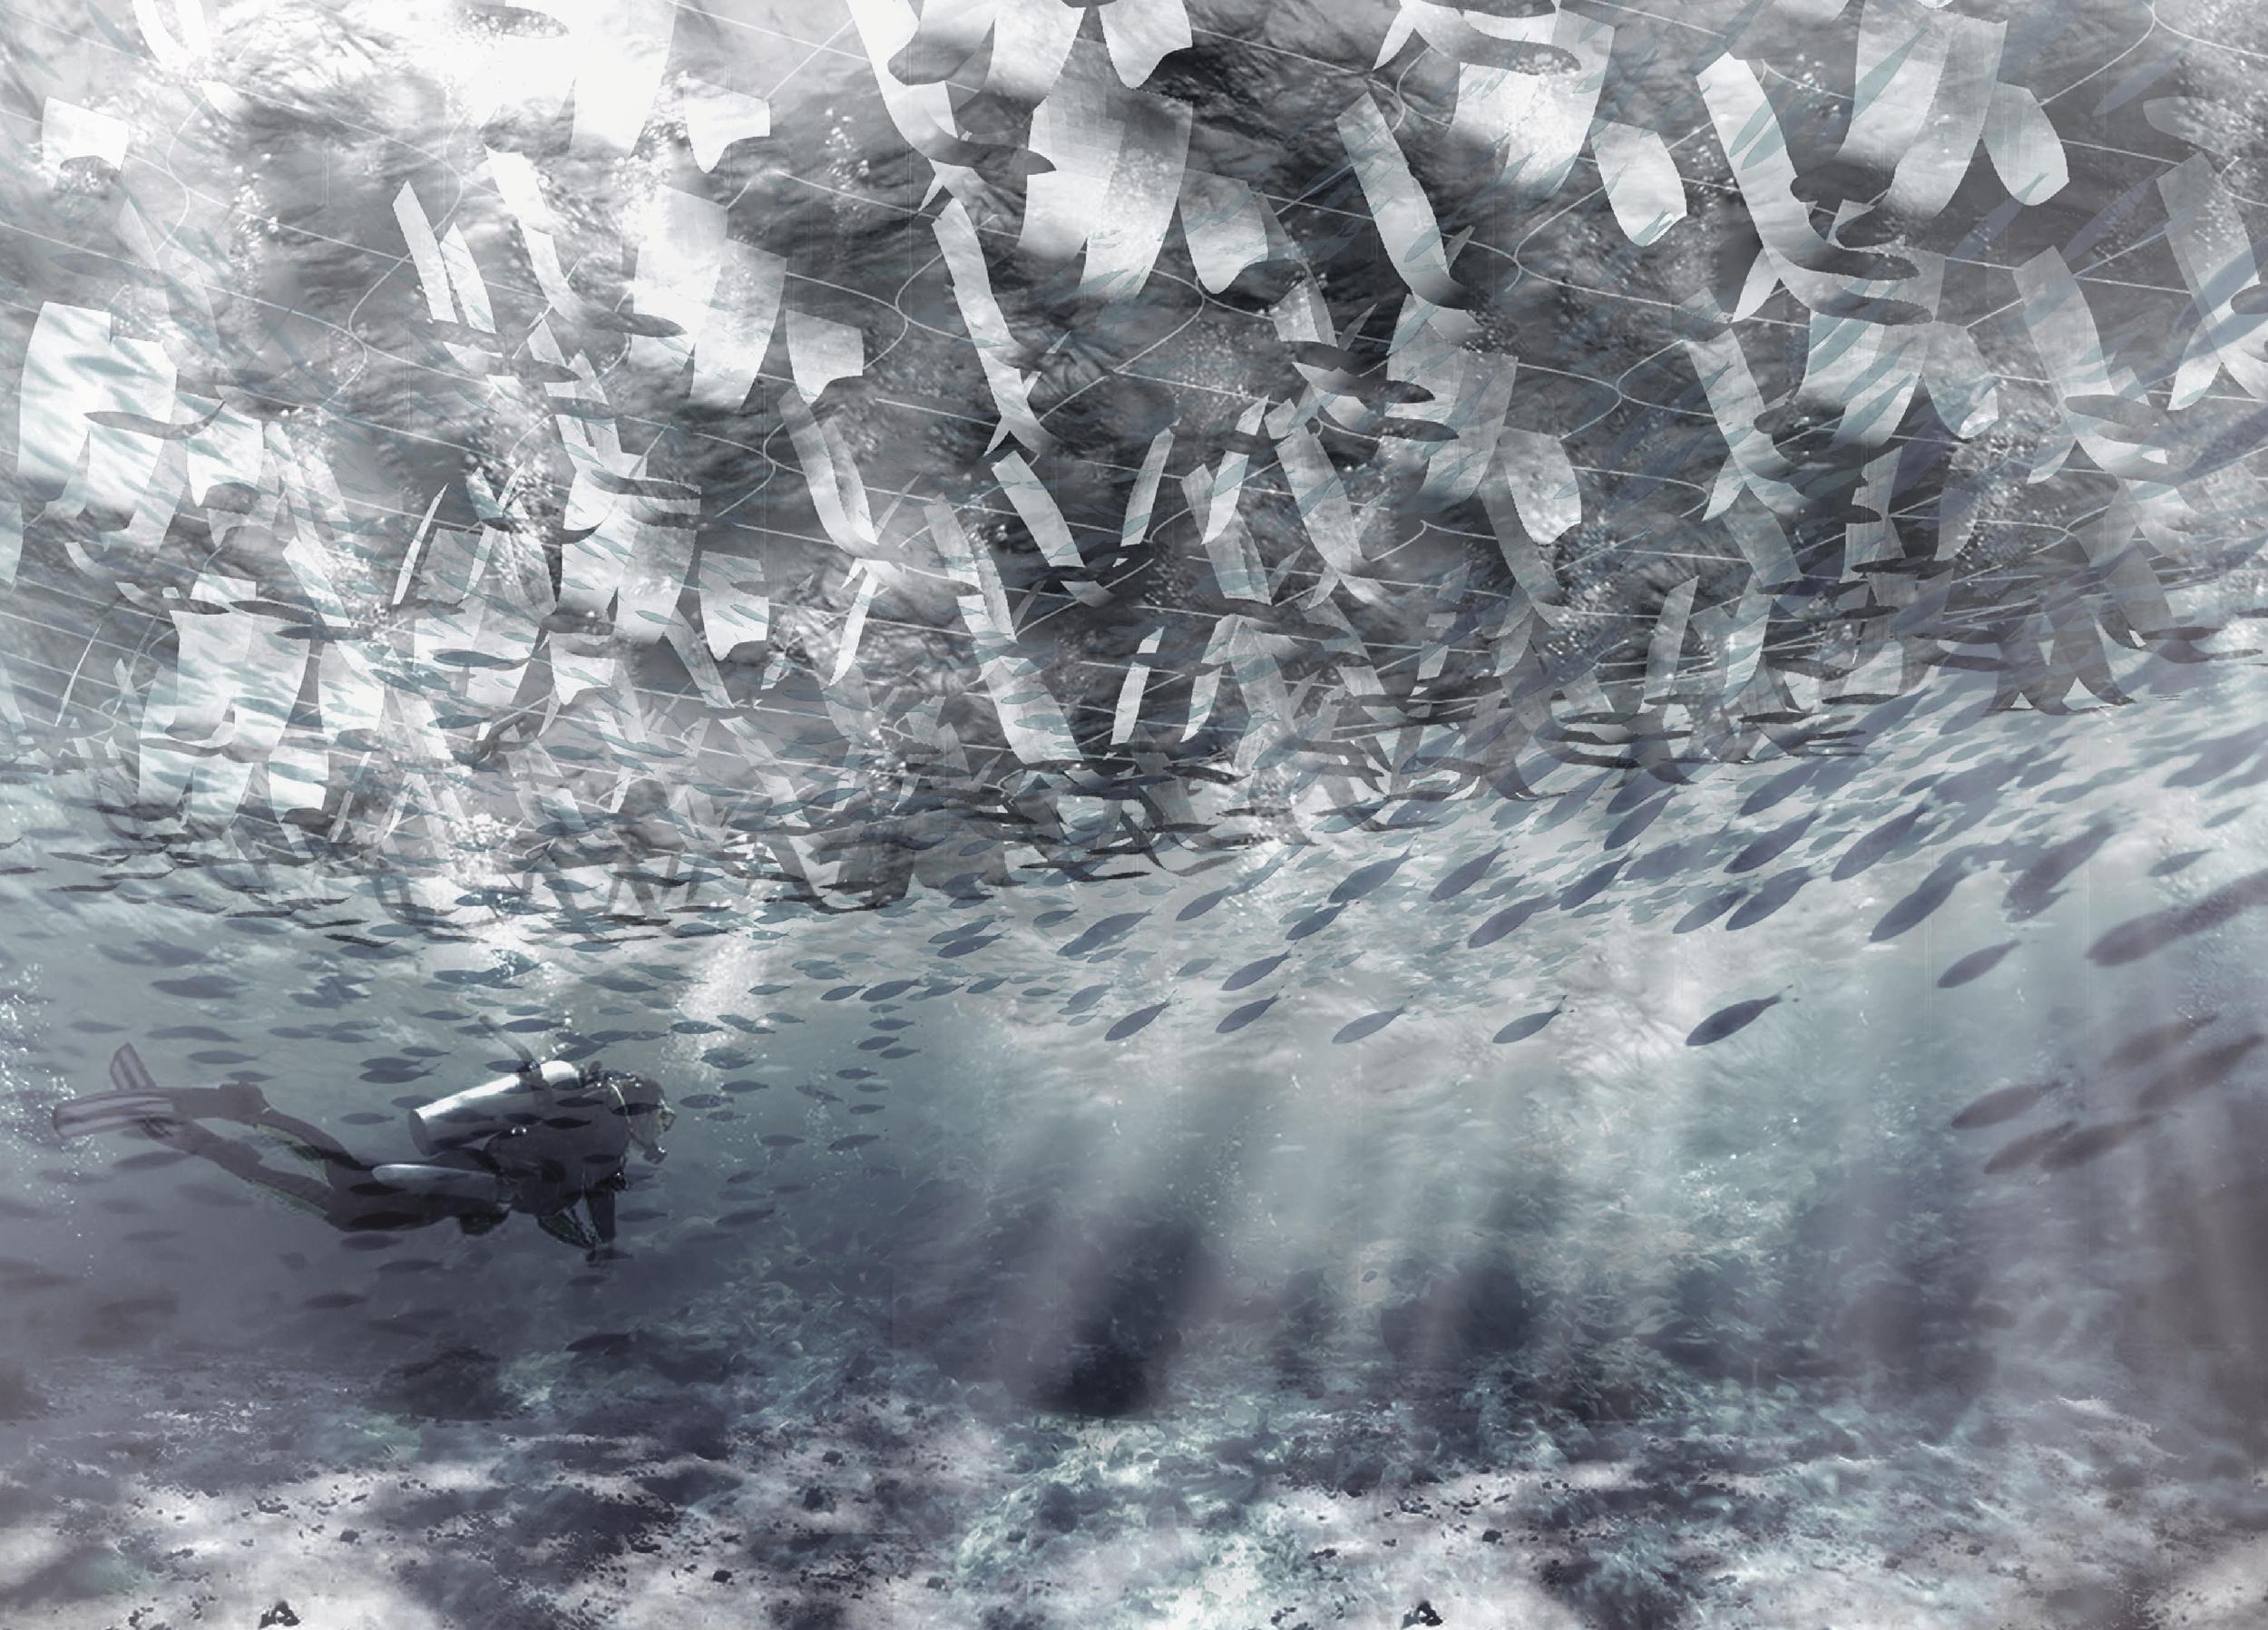 Inverted Ecologies, by Vaama Joshi and Shirin Monshipouri